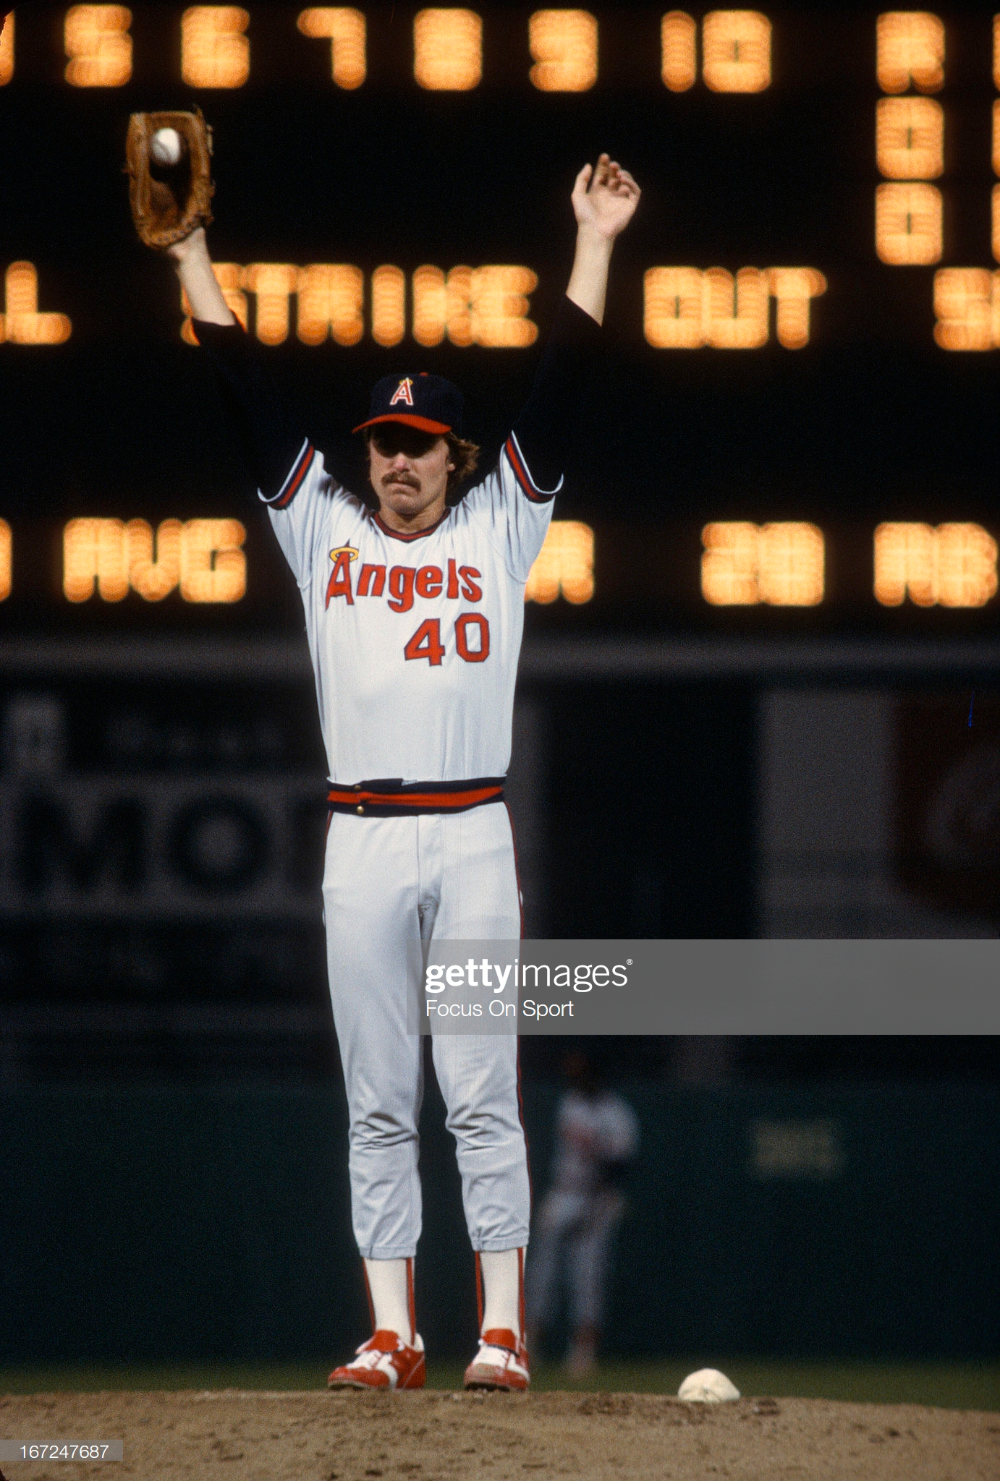 Frank Tanana Of The California Angels Stretches On The Mound During Angels Baseball Pittsburgh Pirates Baseball Major League Baseball Teams